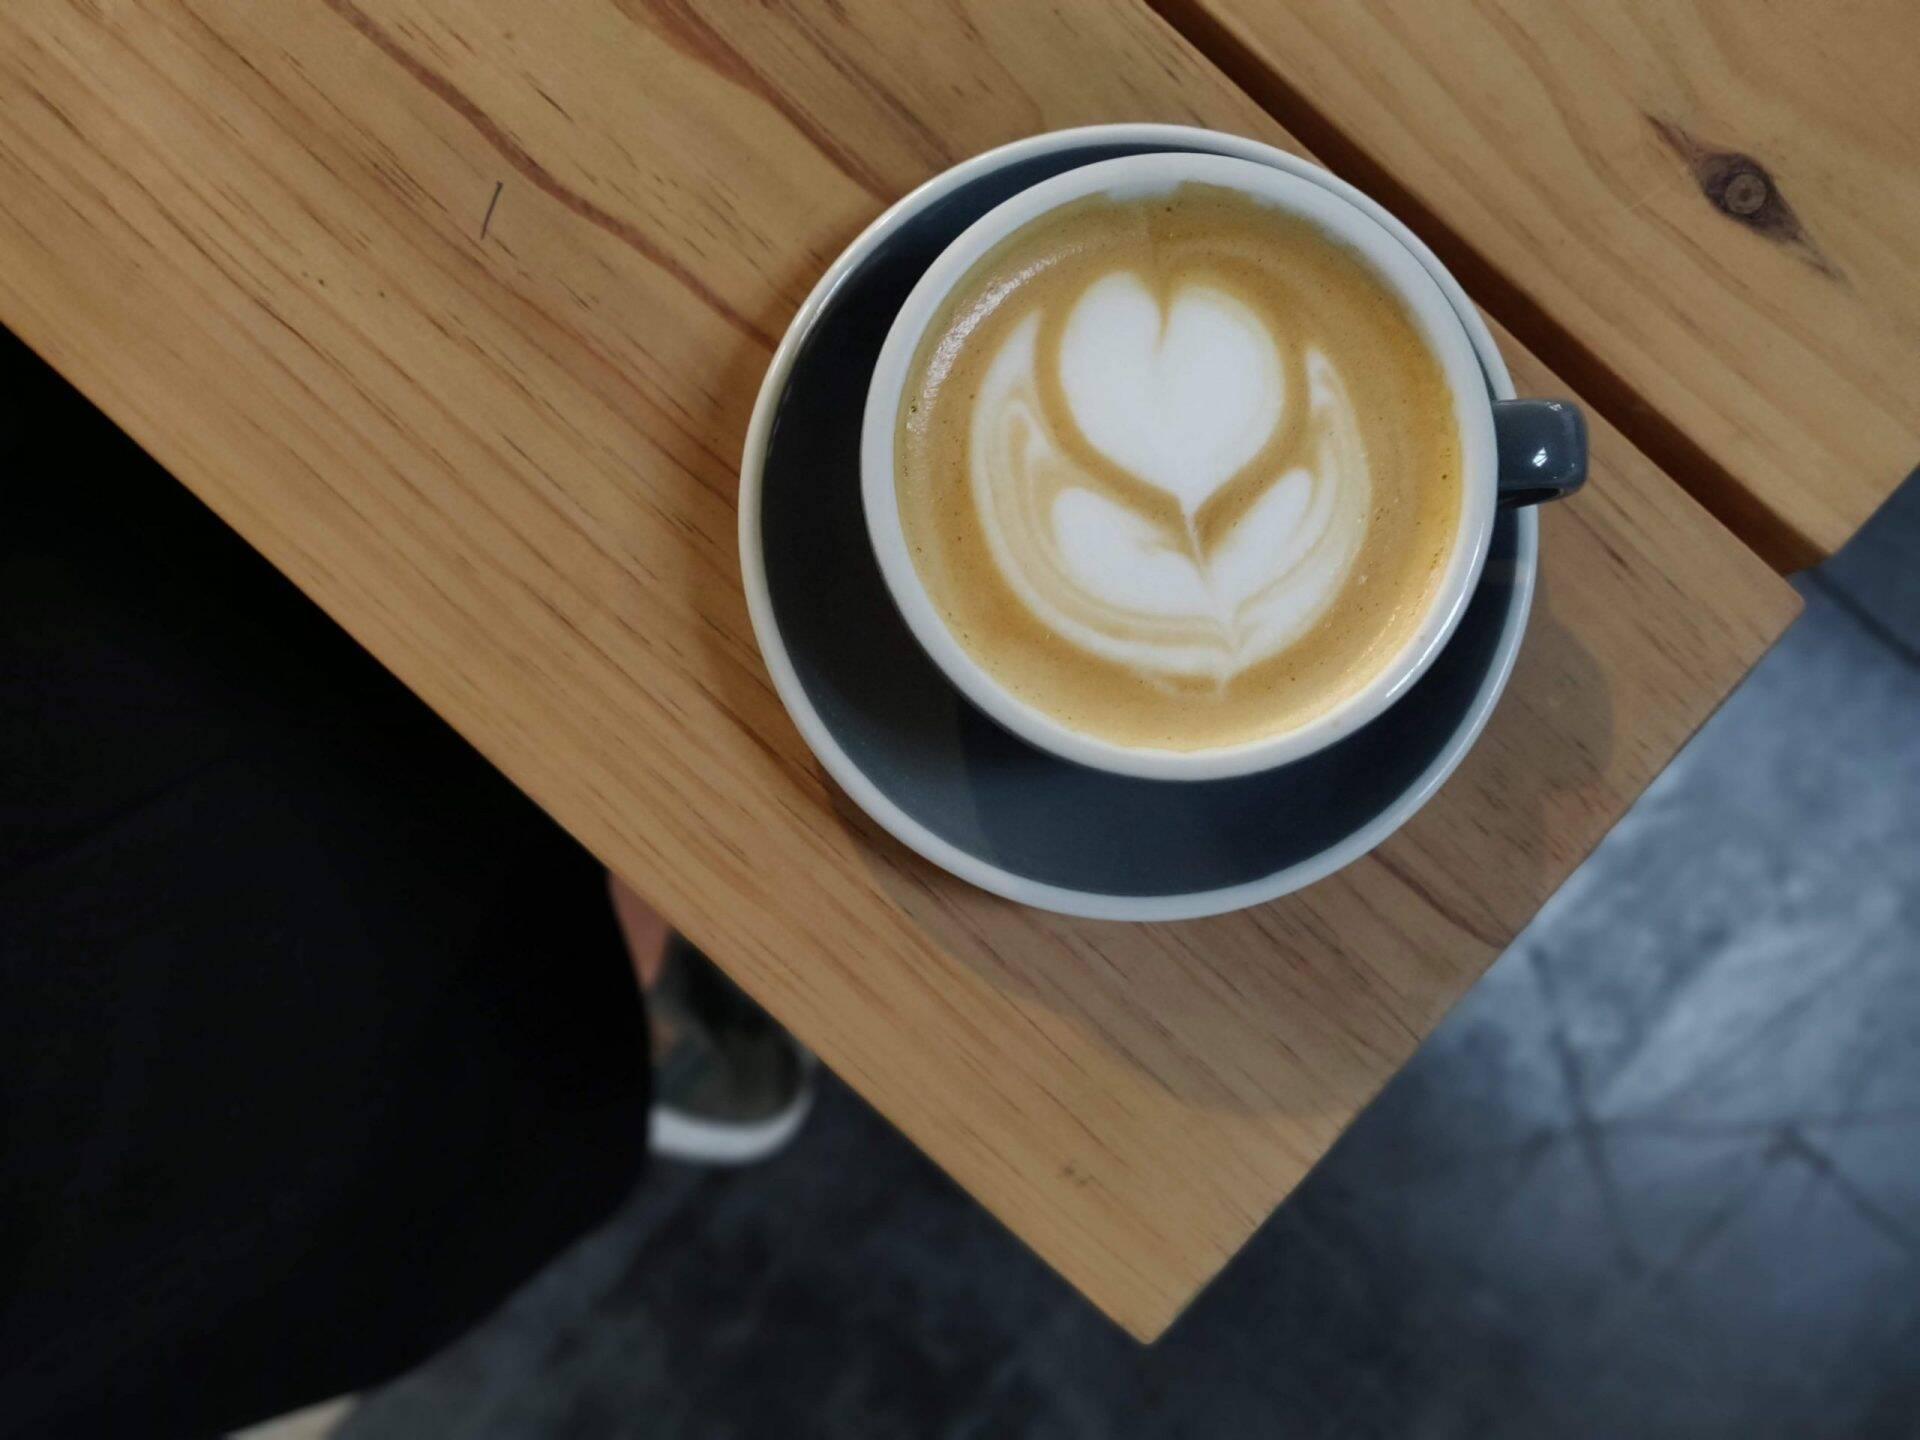 SKYE Coffee Co. in Barcelona